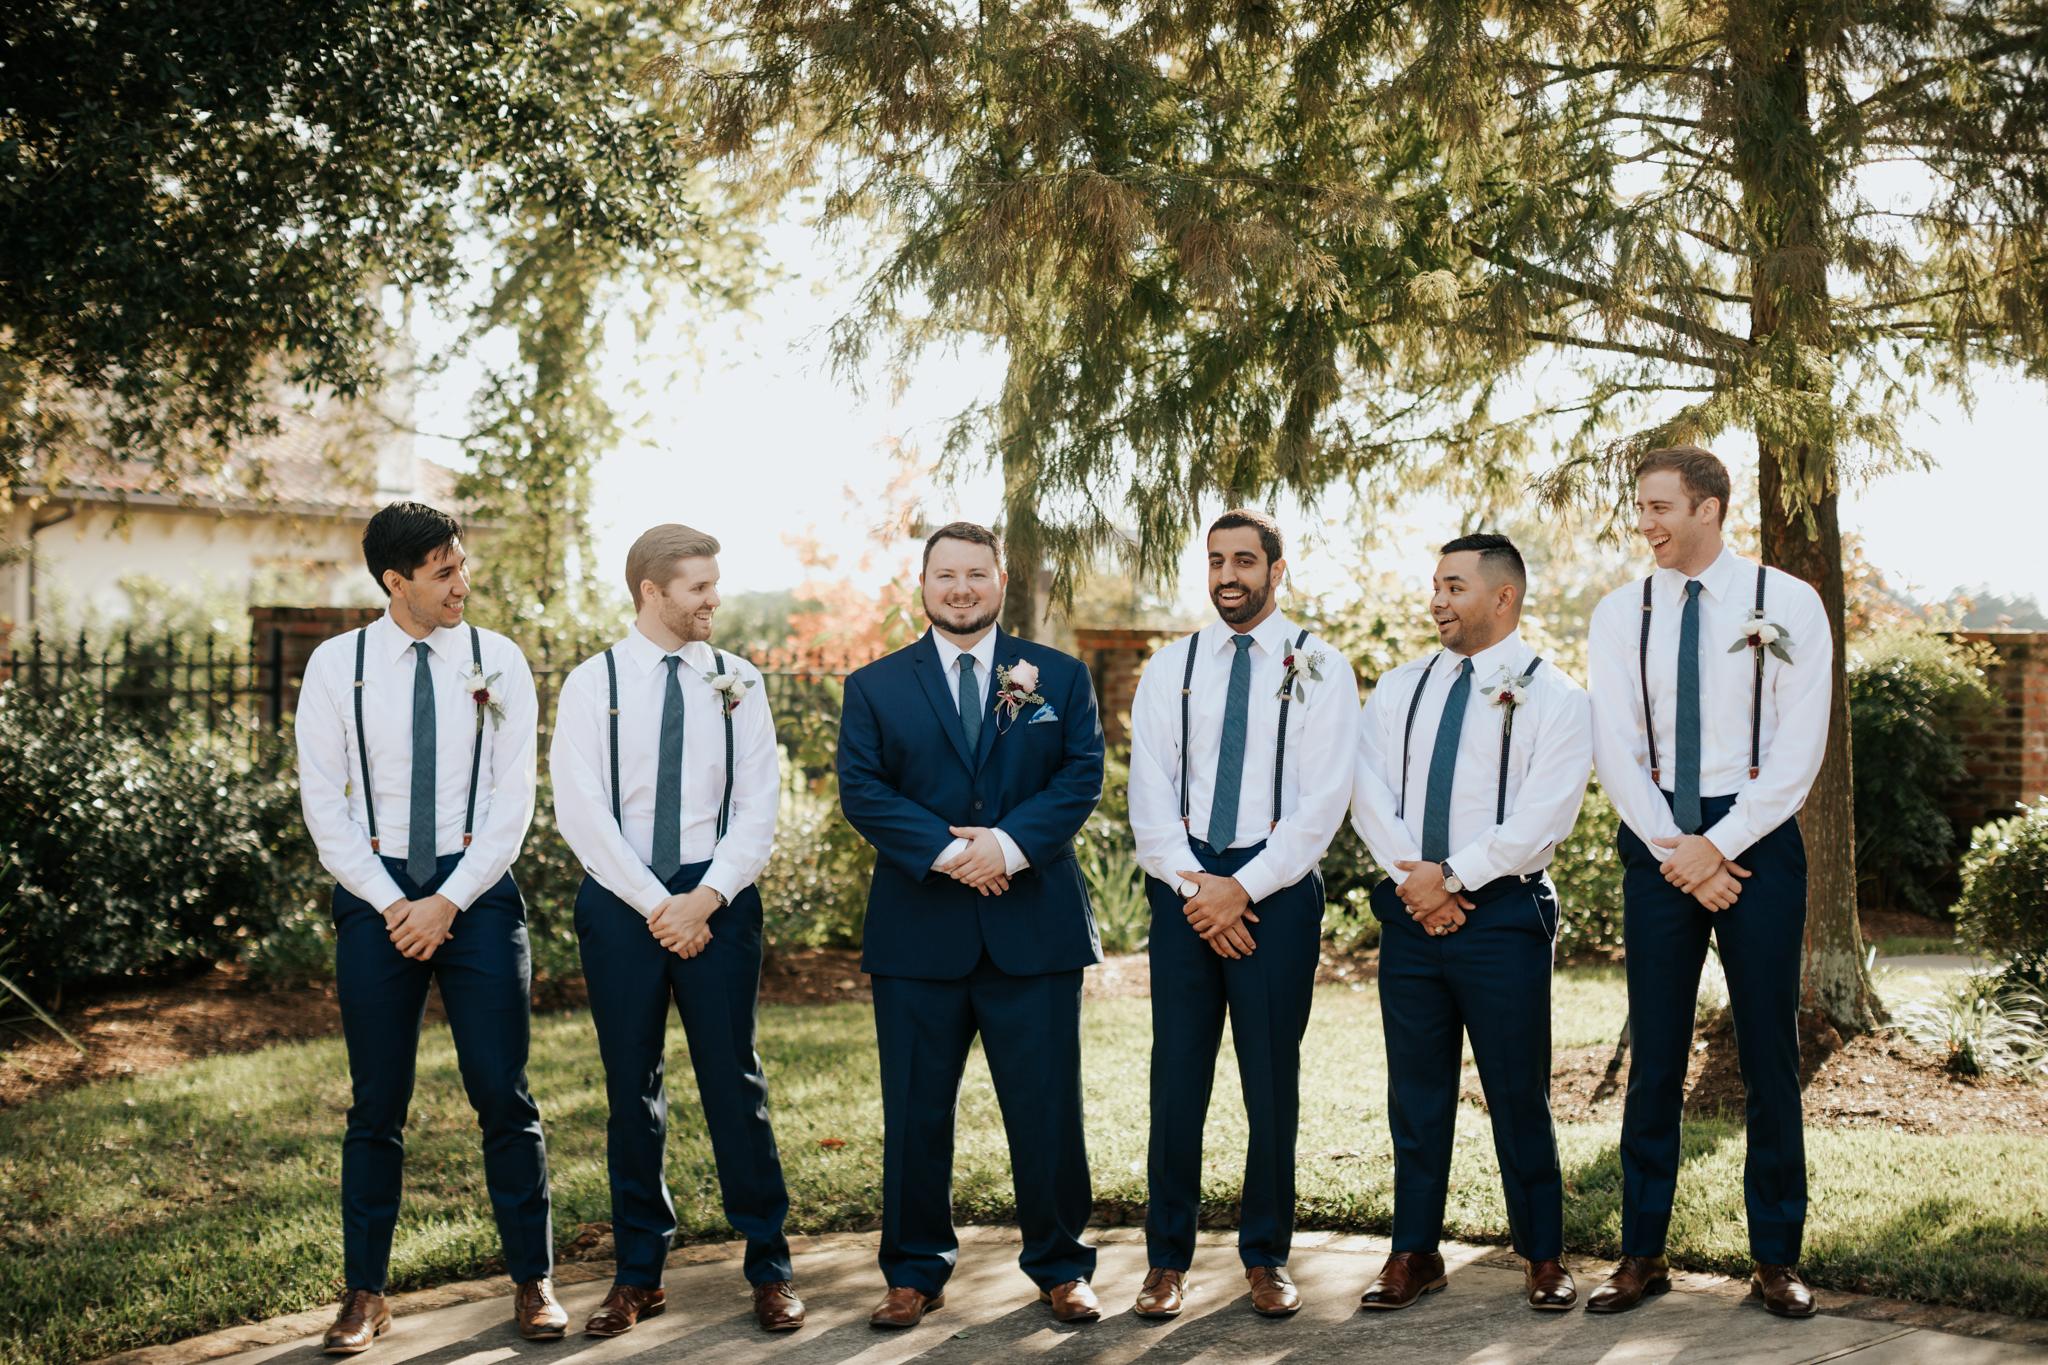 Leah Nicole Photography - Houston Wedding Photographer-Lake Conroe Wedding- Houston Wedding Photographer-18.jpg